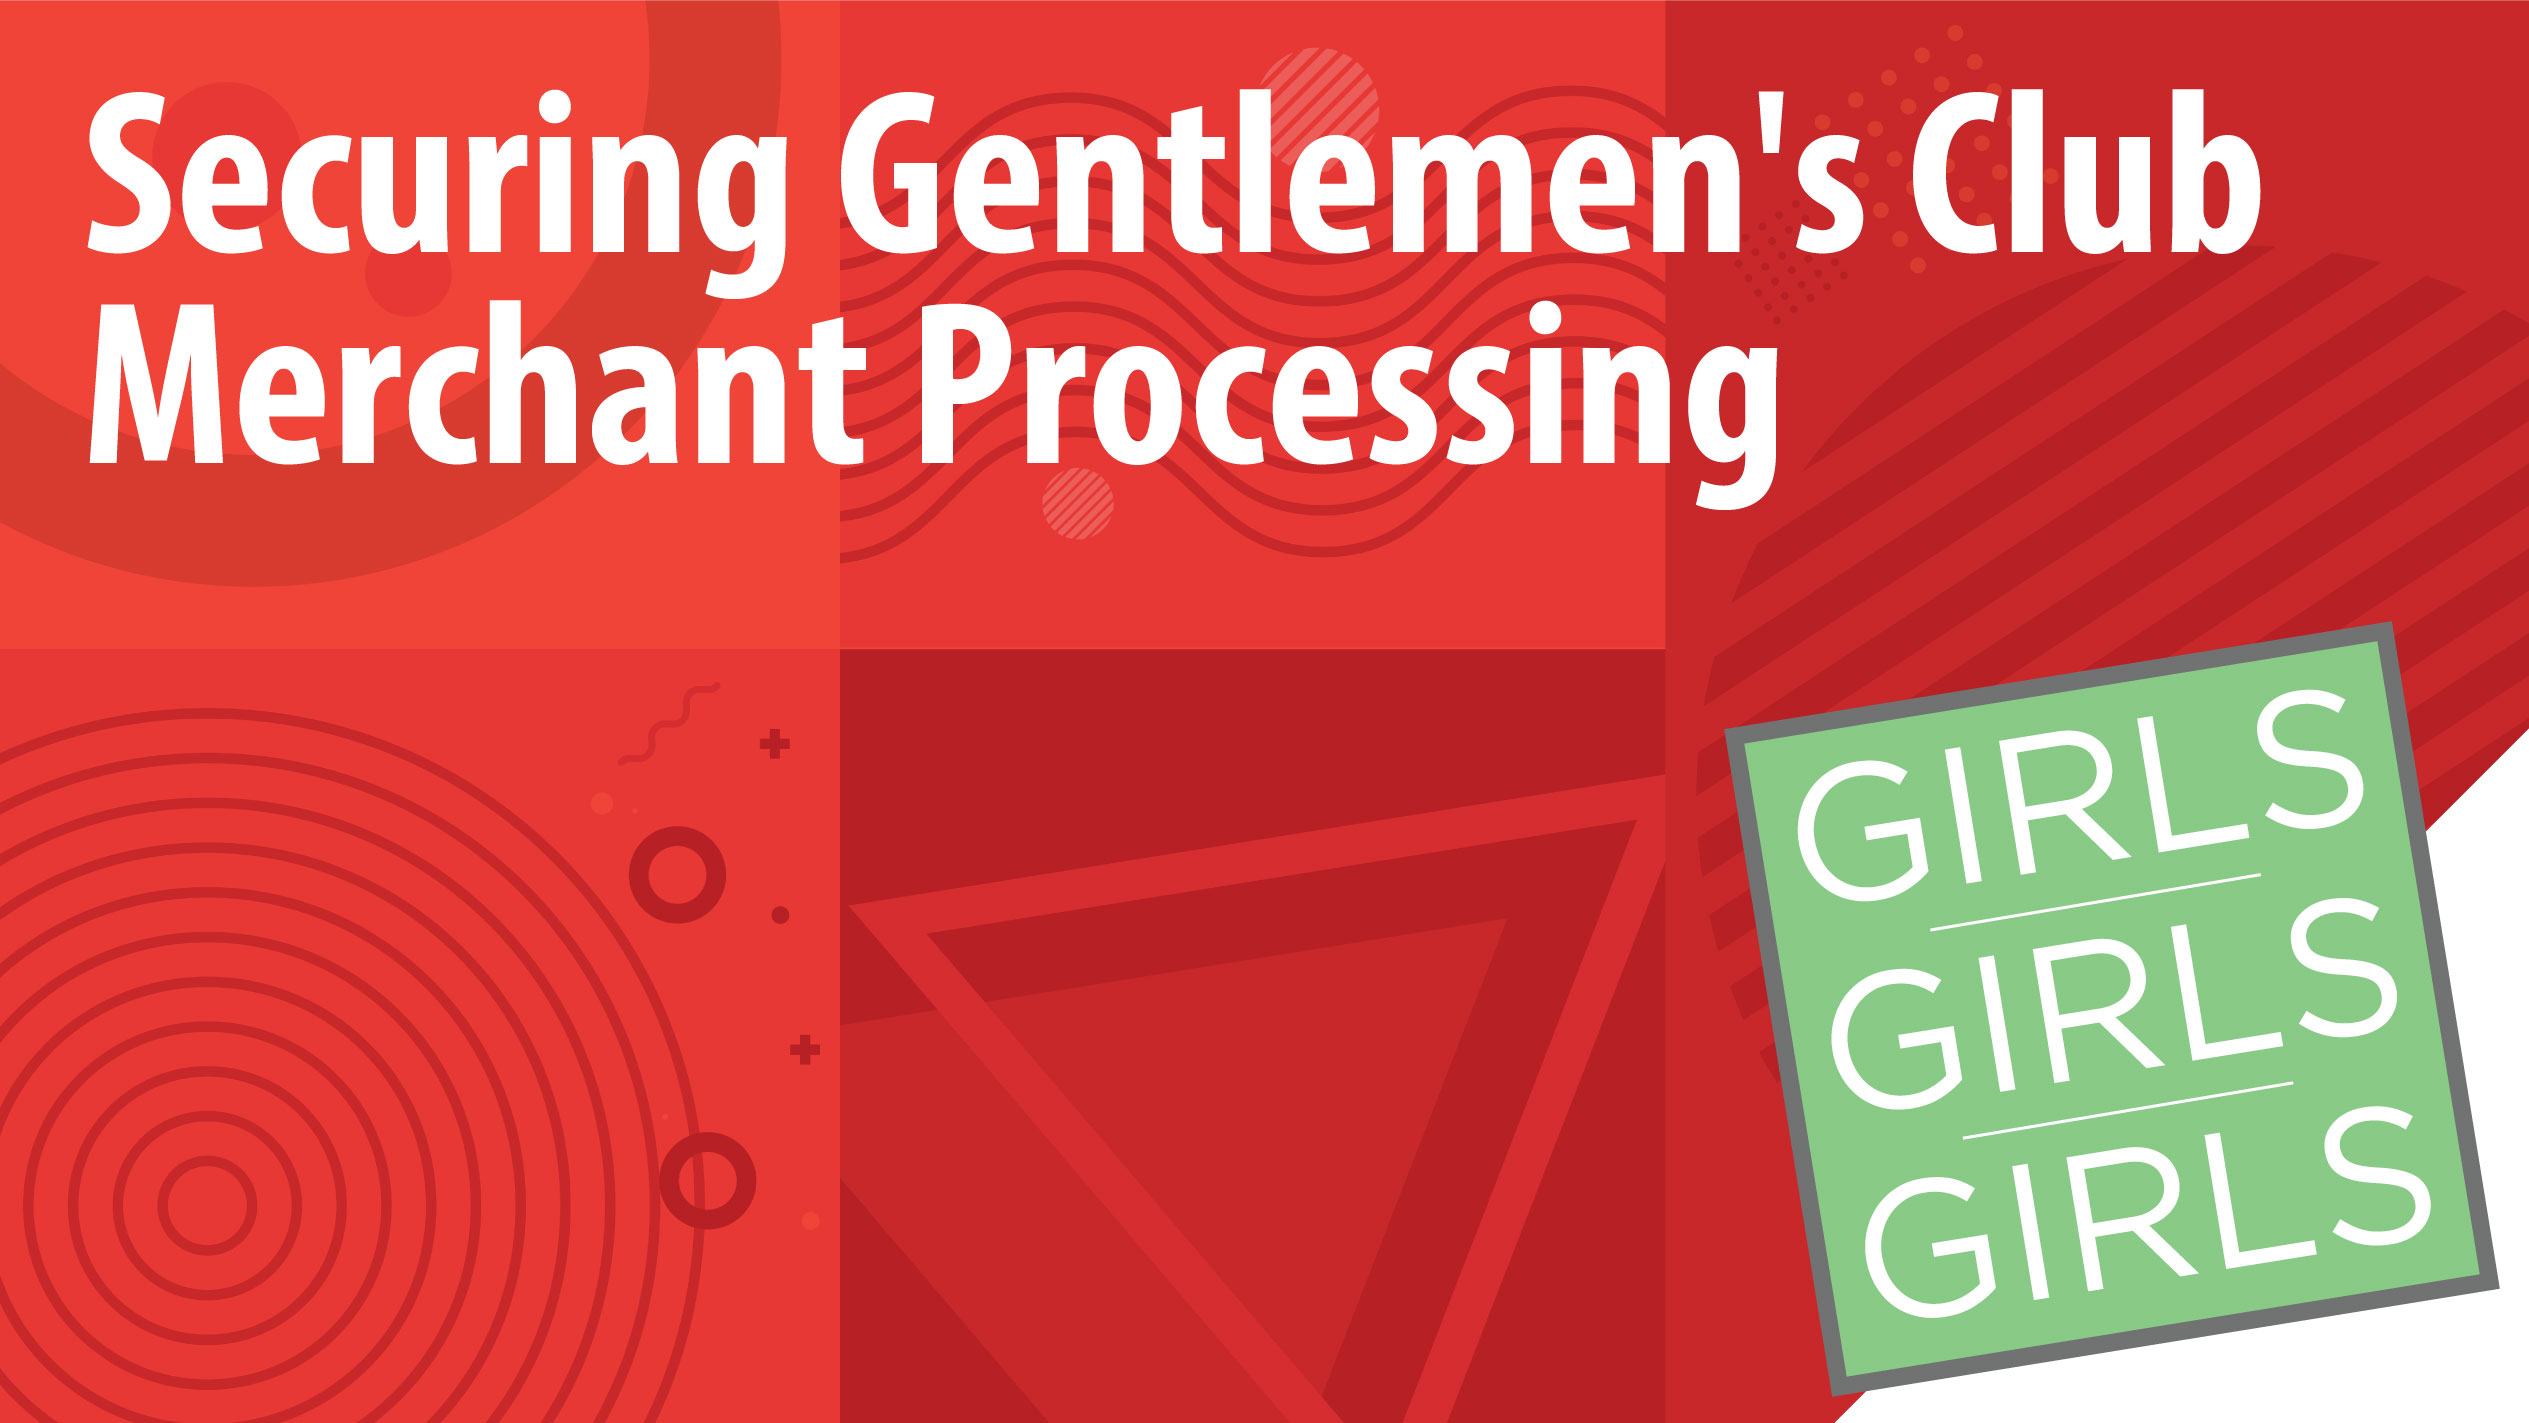 Securing Strip Club Merchant Processing